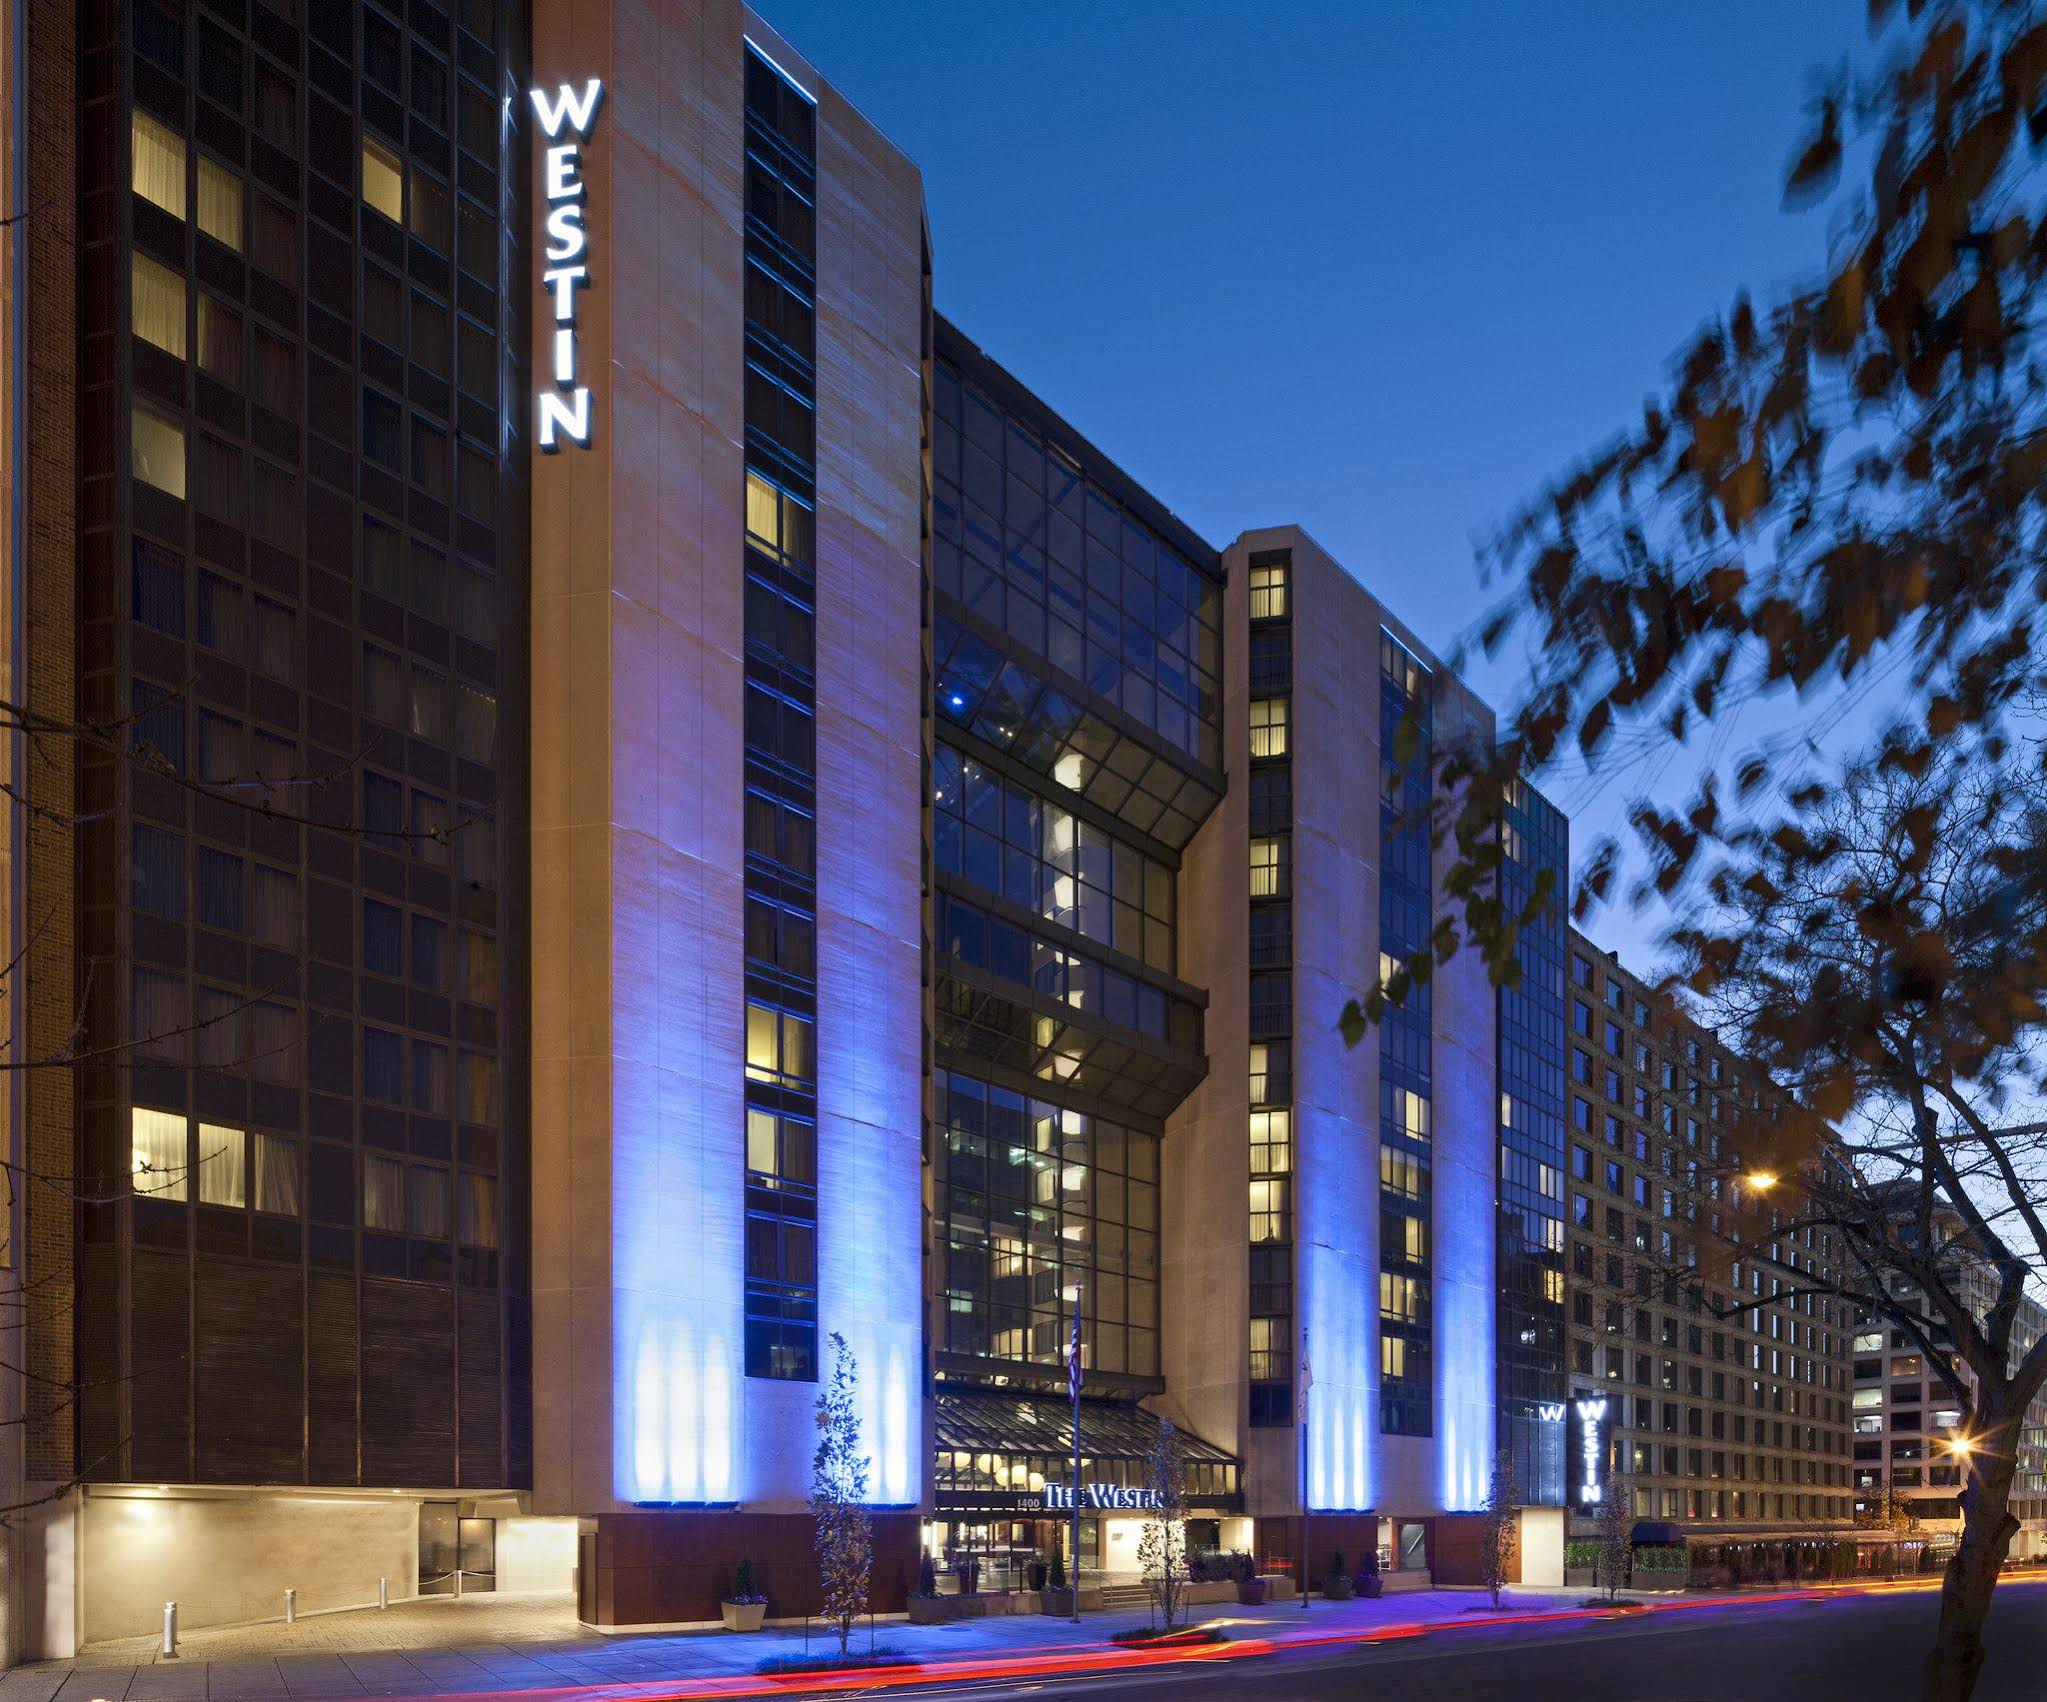 The Westin Washington D.C. City Center